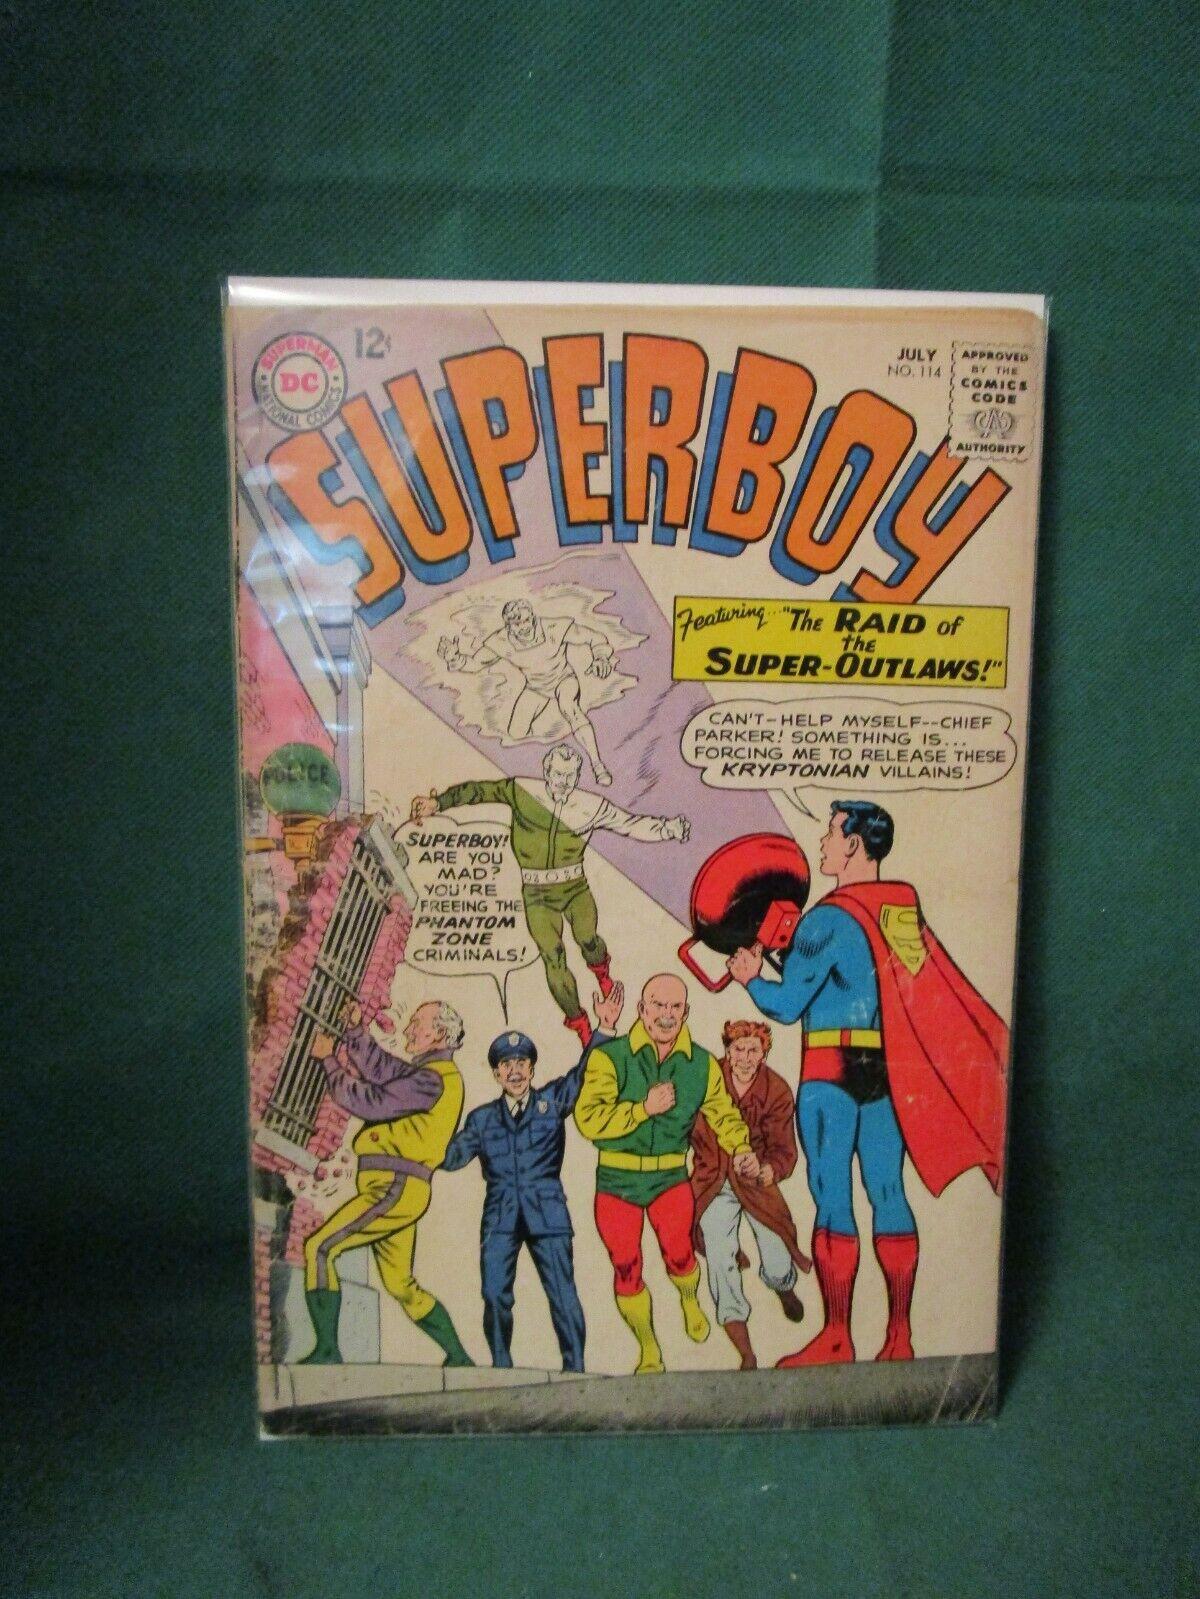 1964 DC Comics - Superboy 114 - 2.0 - $4.20